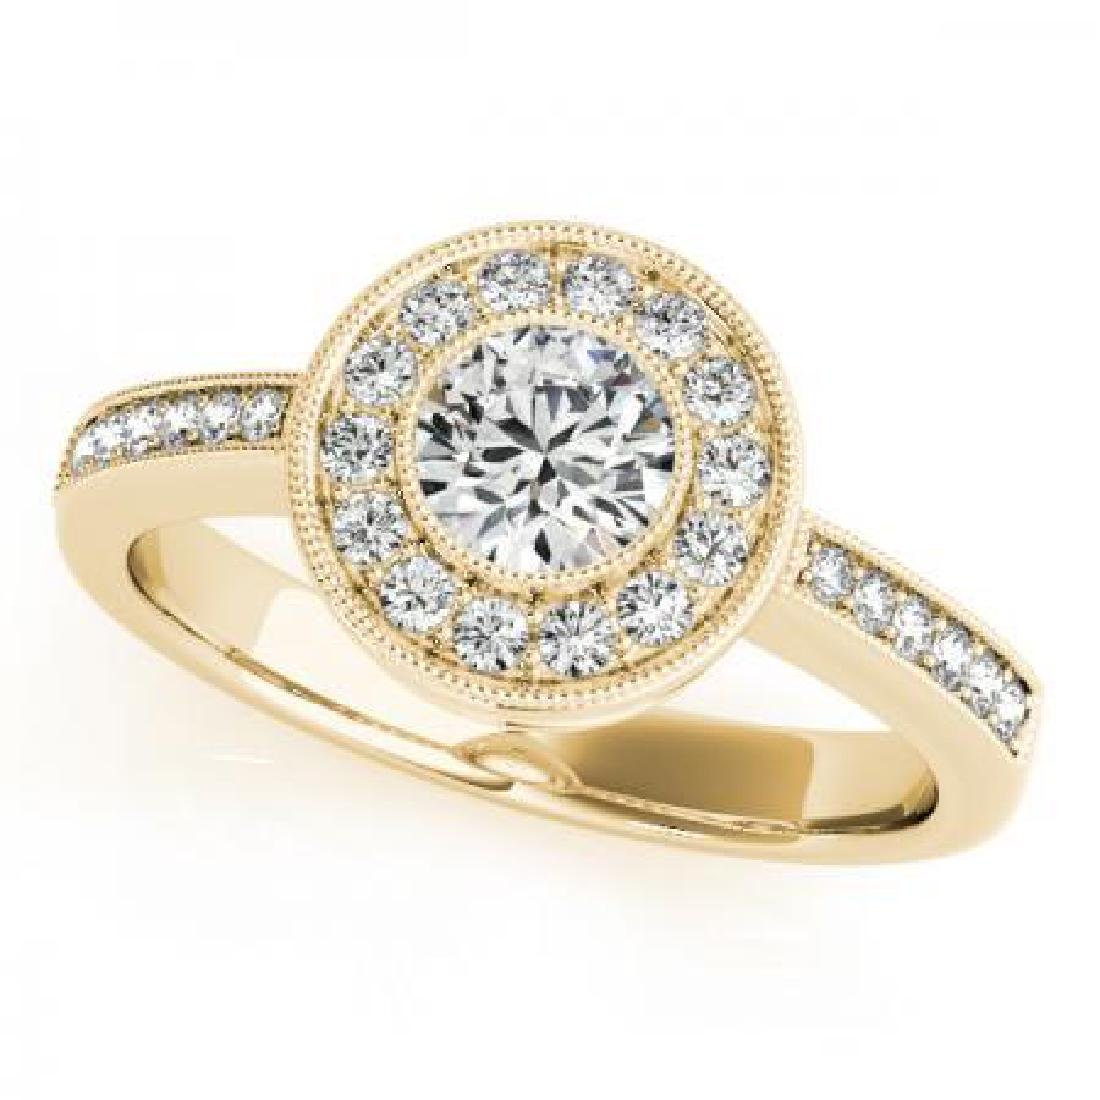 CERTIFIED 18K YELLOW GOLD 2.50 CT G-H/VS-SI1 DIAMOND HA